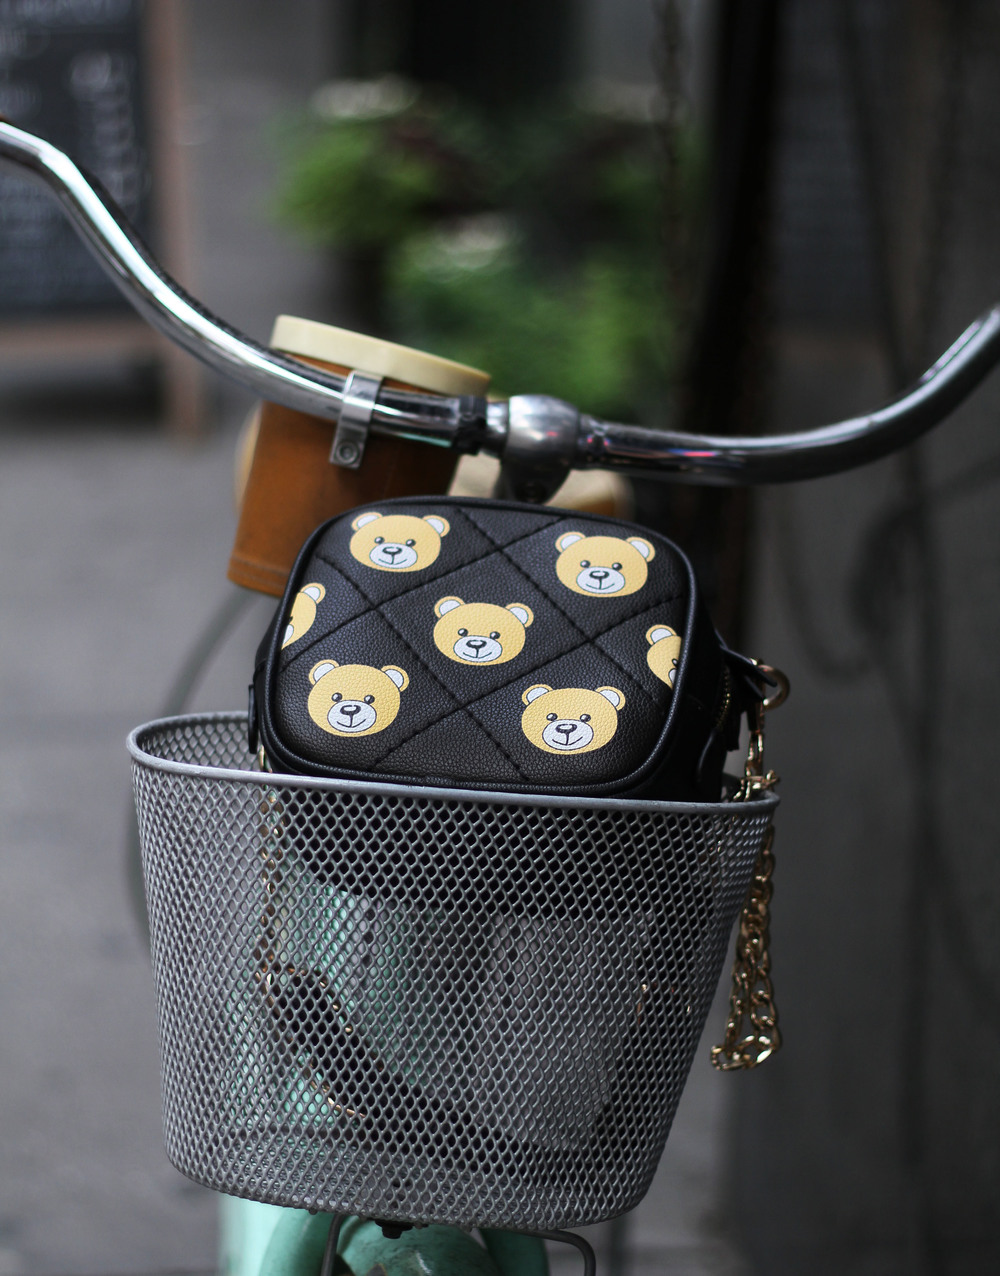 The honey bear bag fun bag 4.jpg